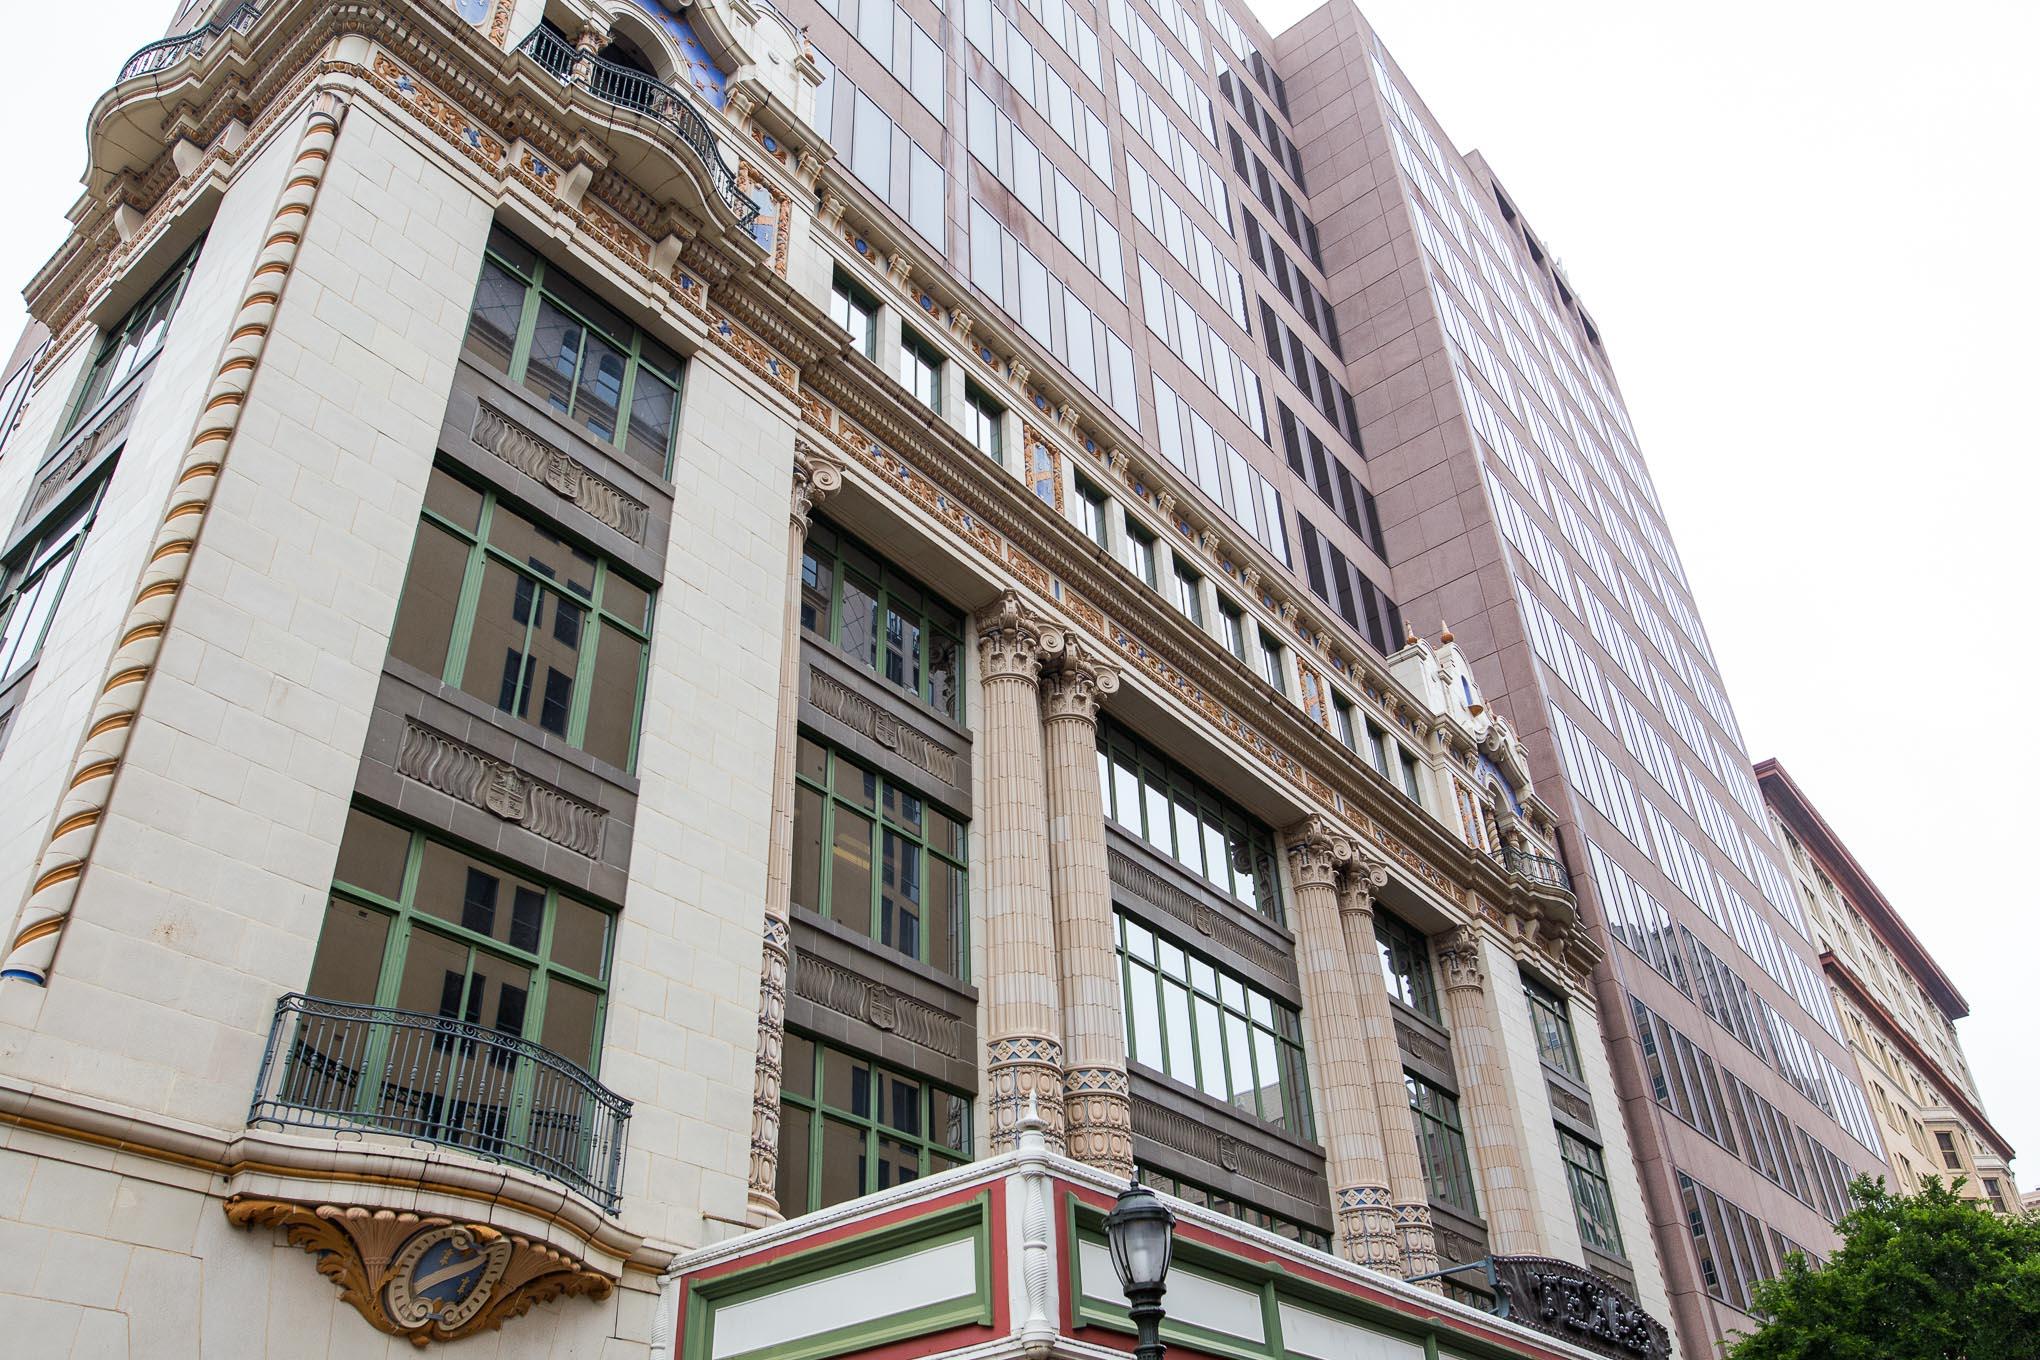 The historic Texas Theater facade on East Houston Street. Photo by Scott Ball.